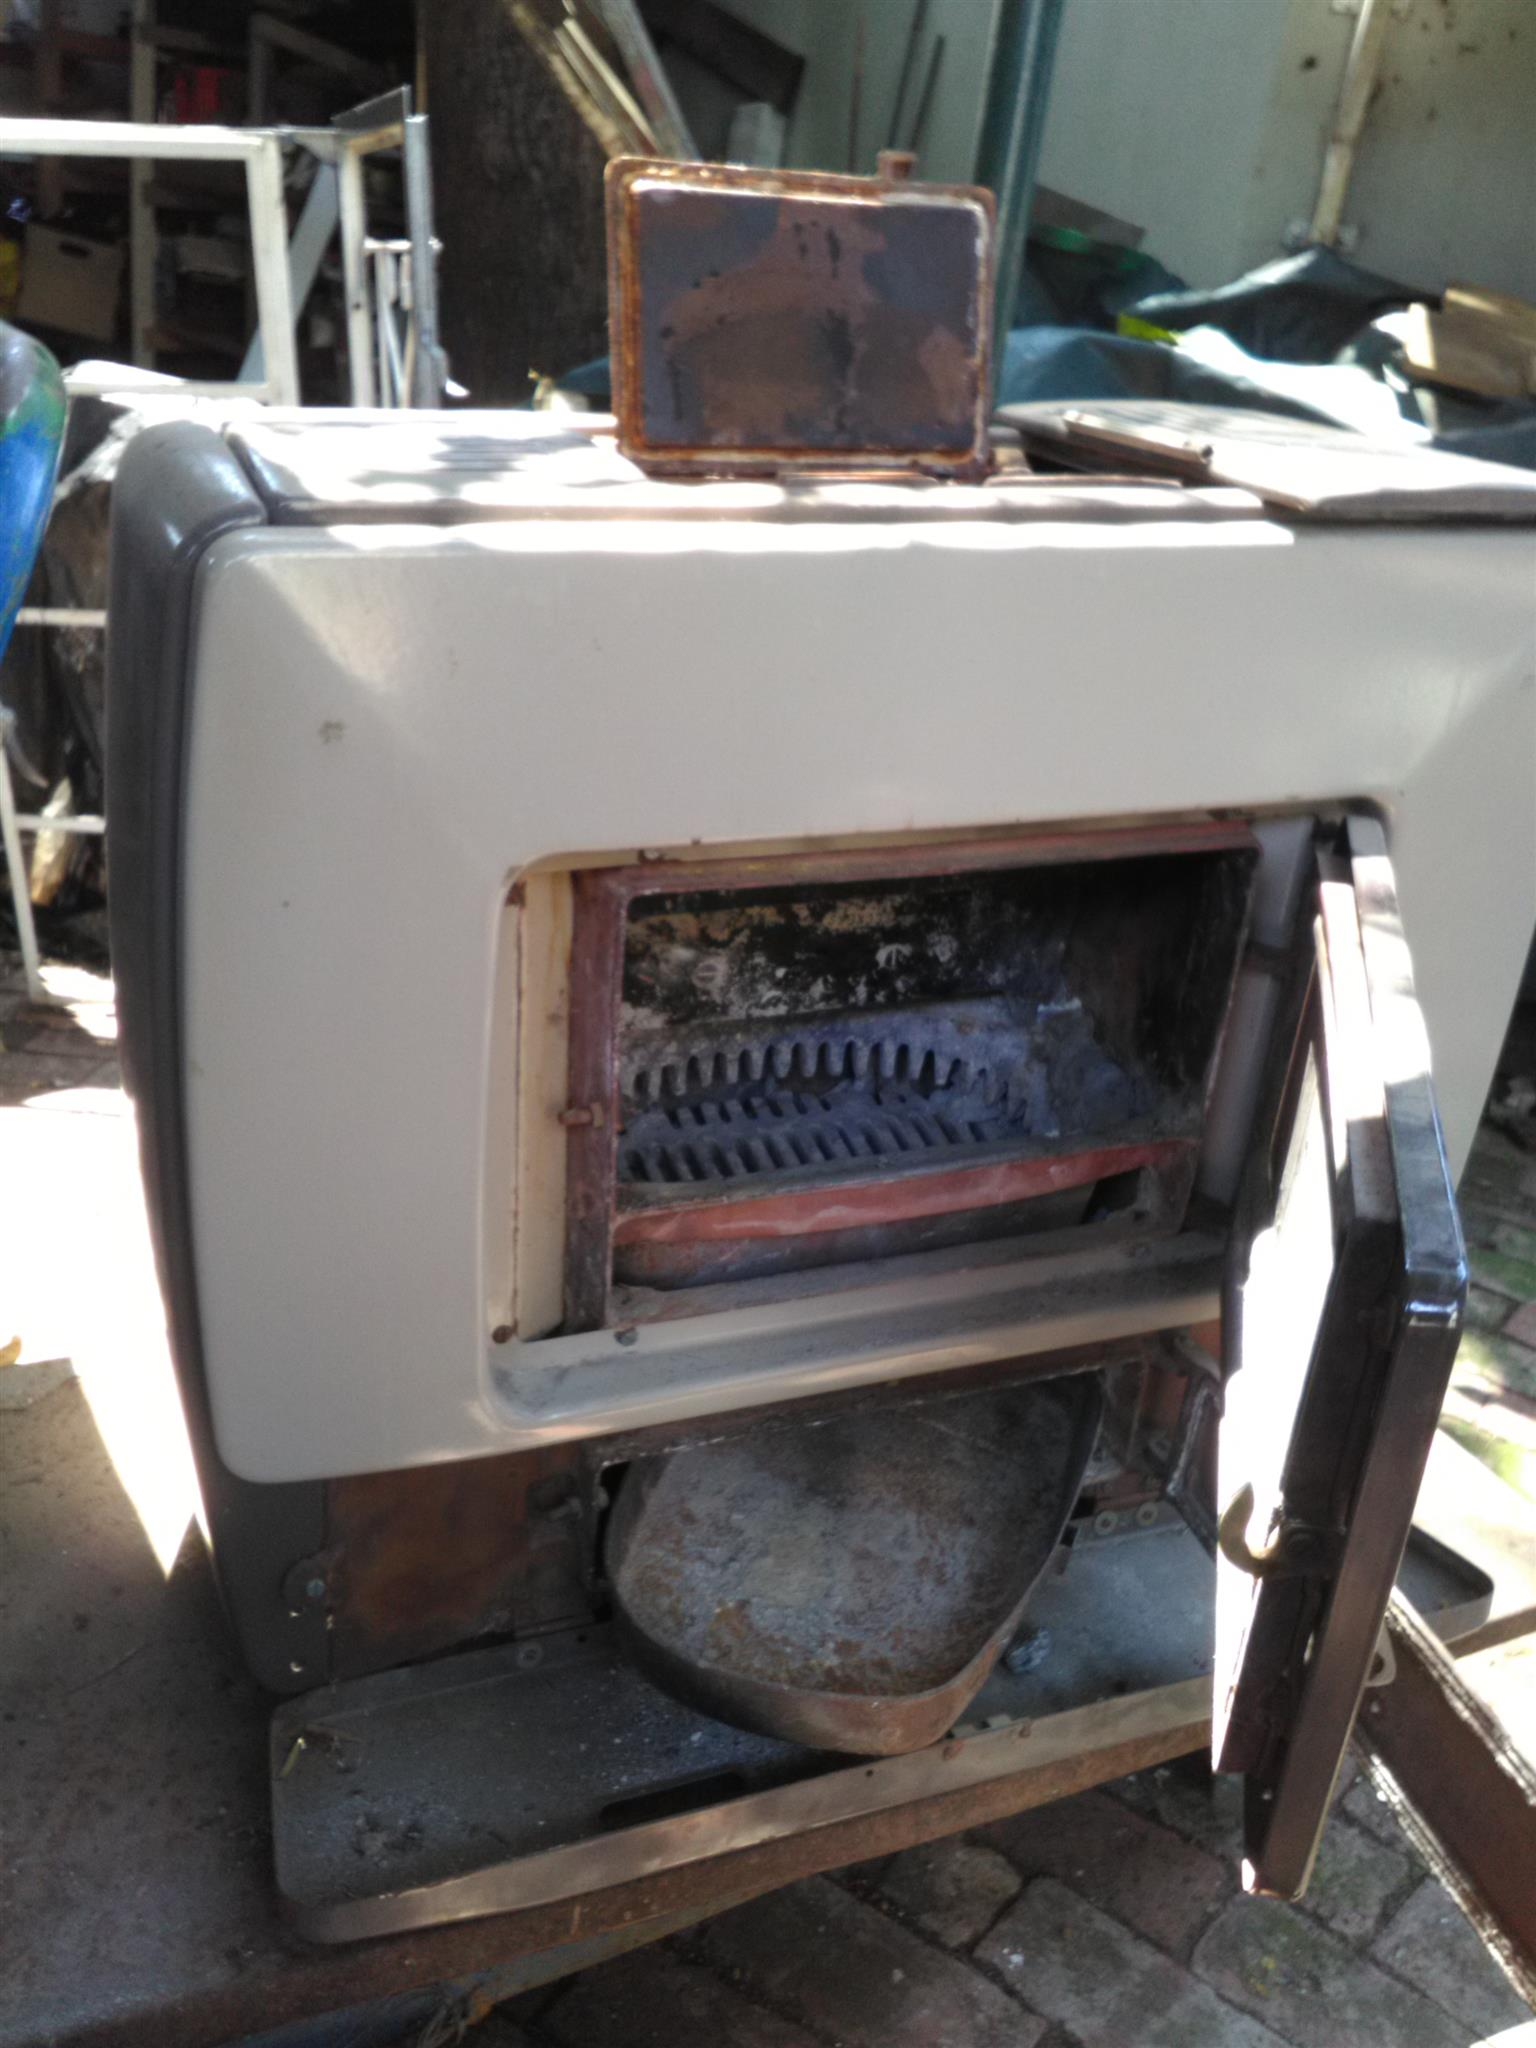 Becker stove